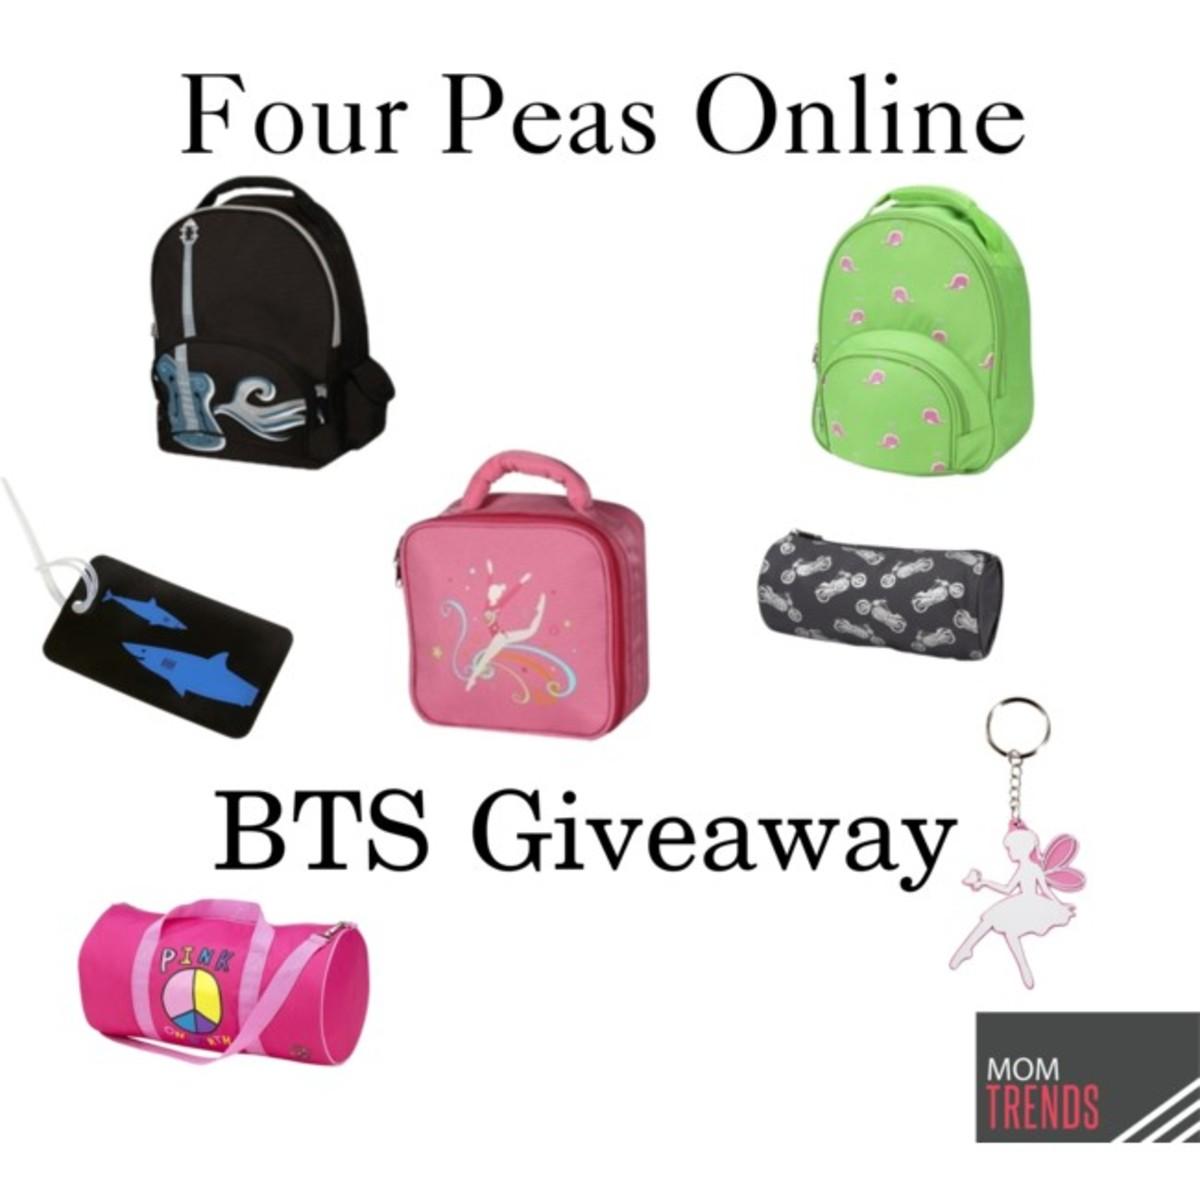 BTS four peas online